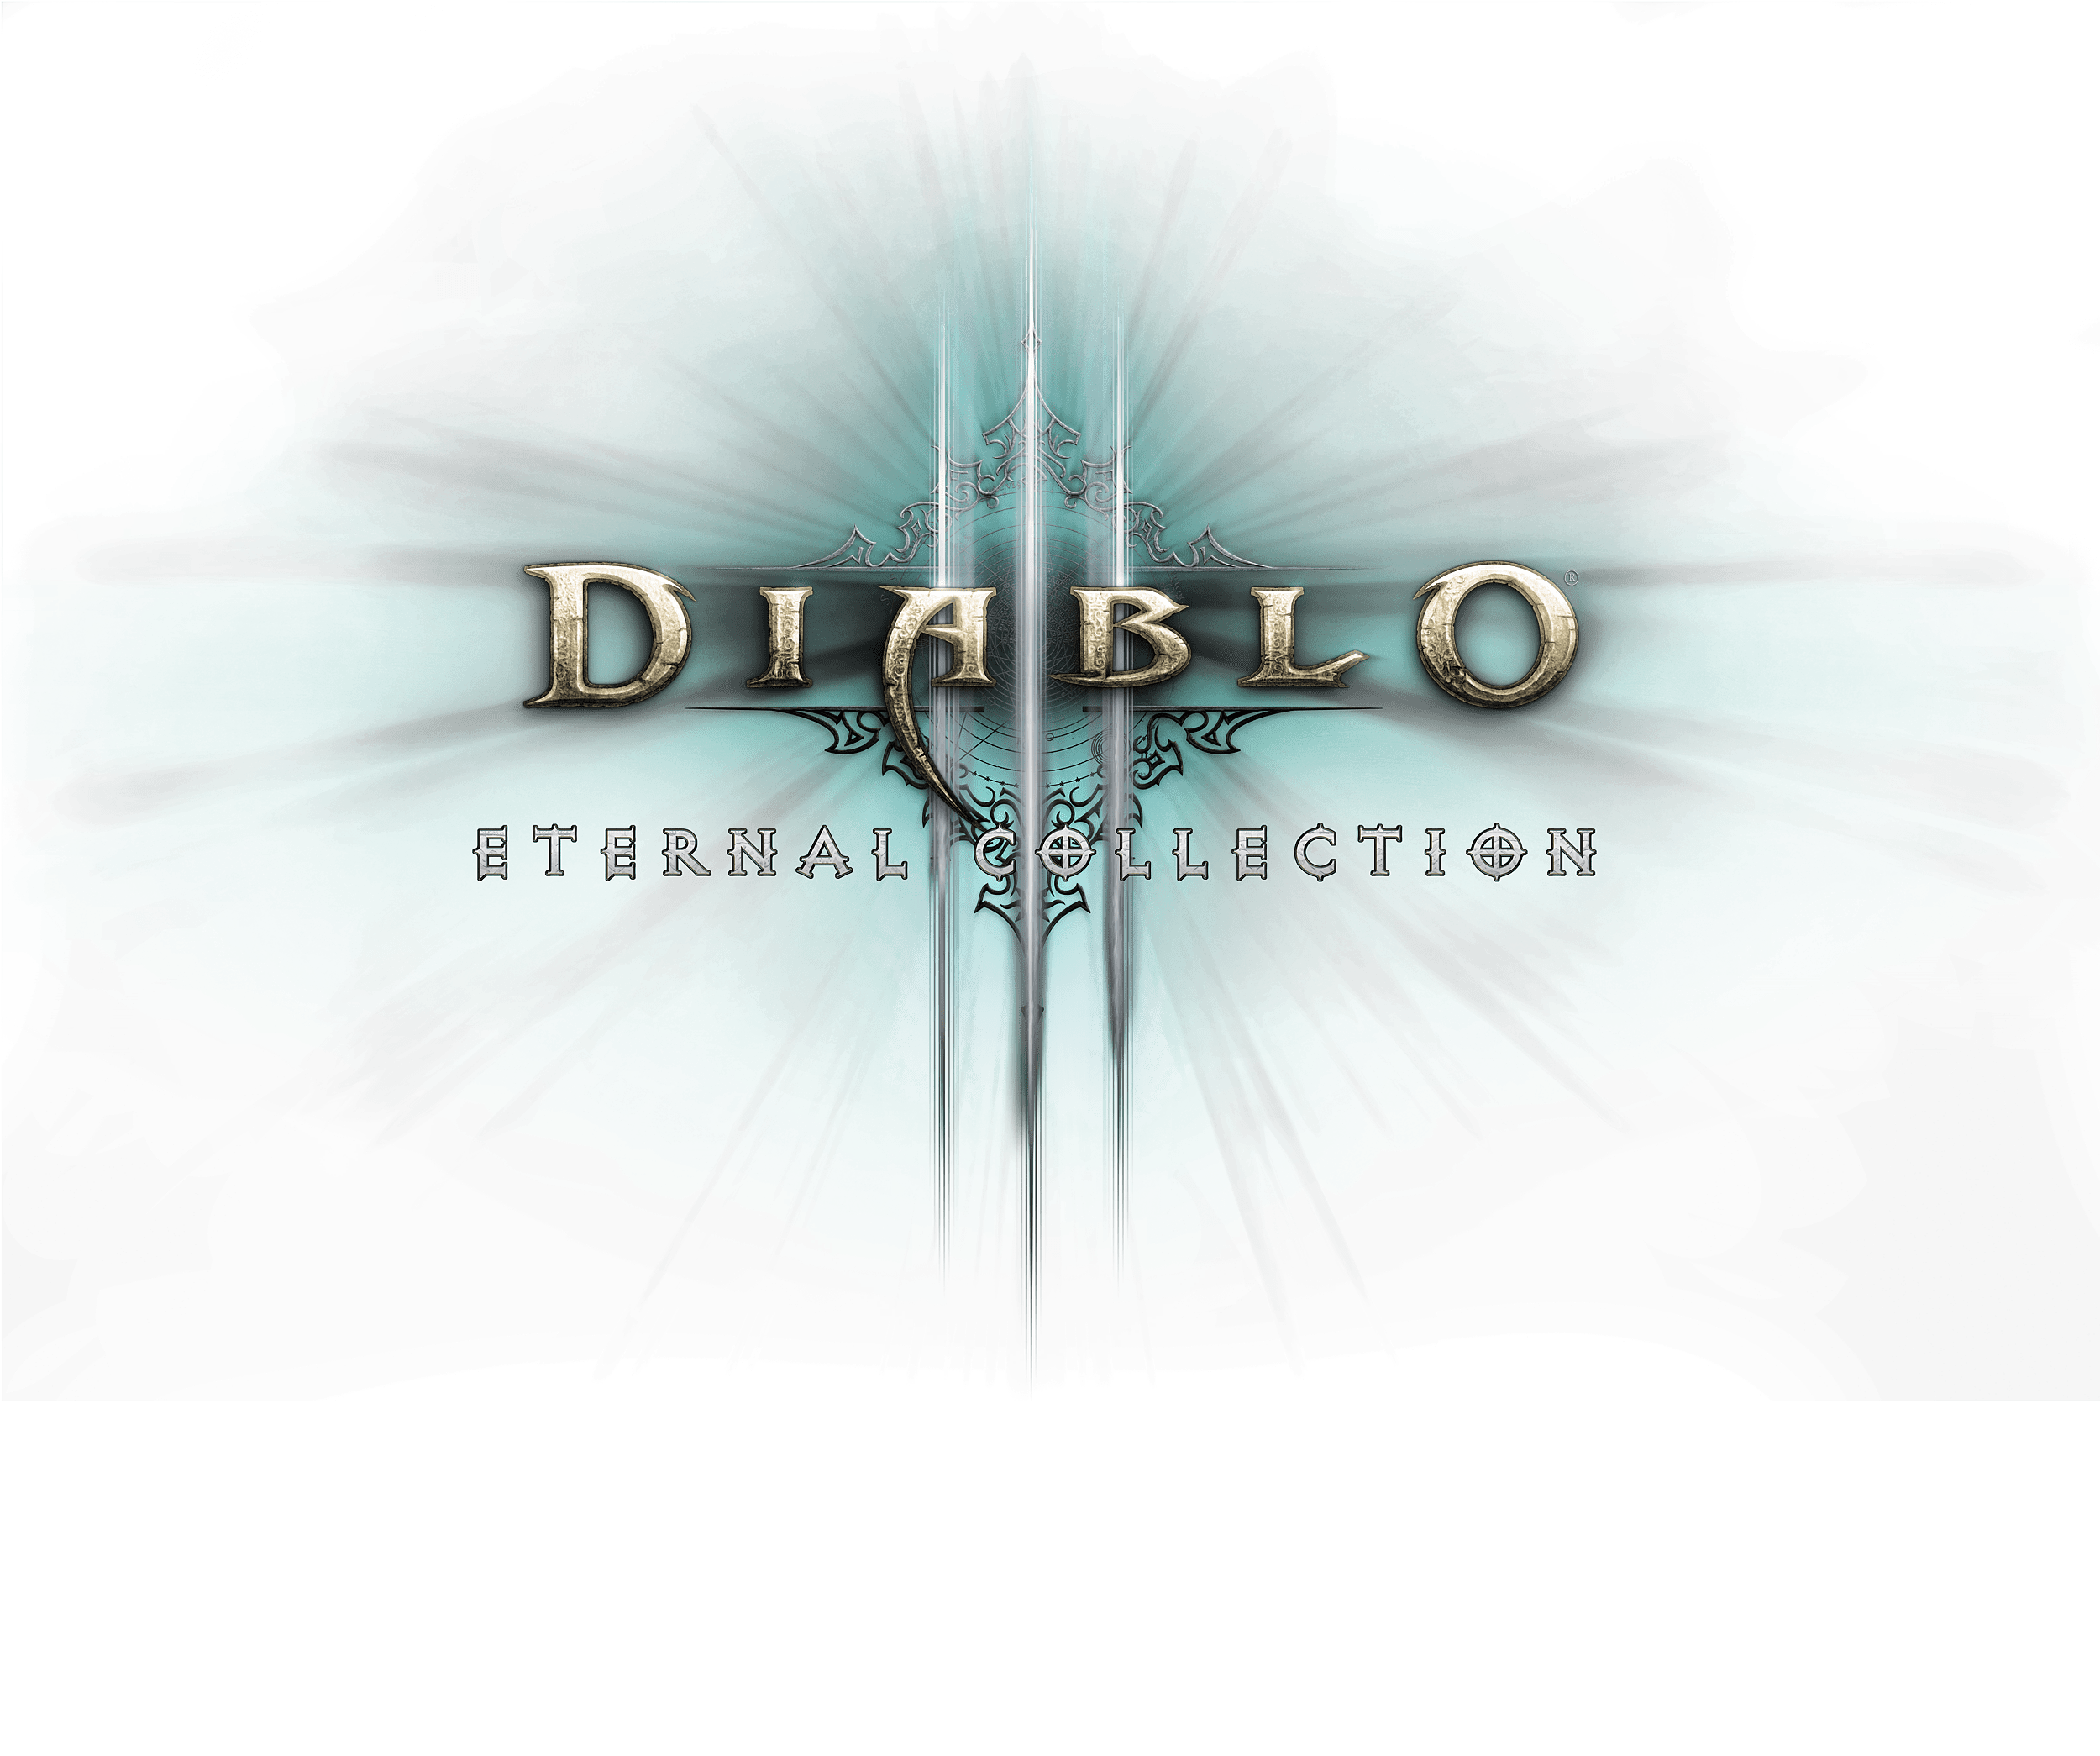 Resultado de imagem para diablo 3 eternal collection logo png